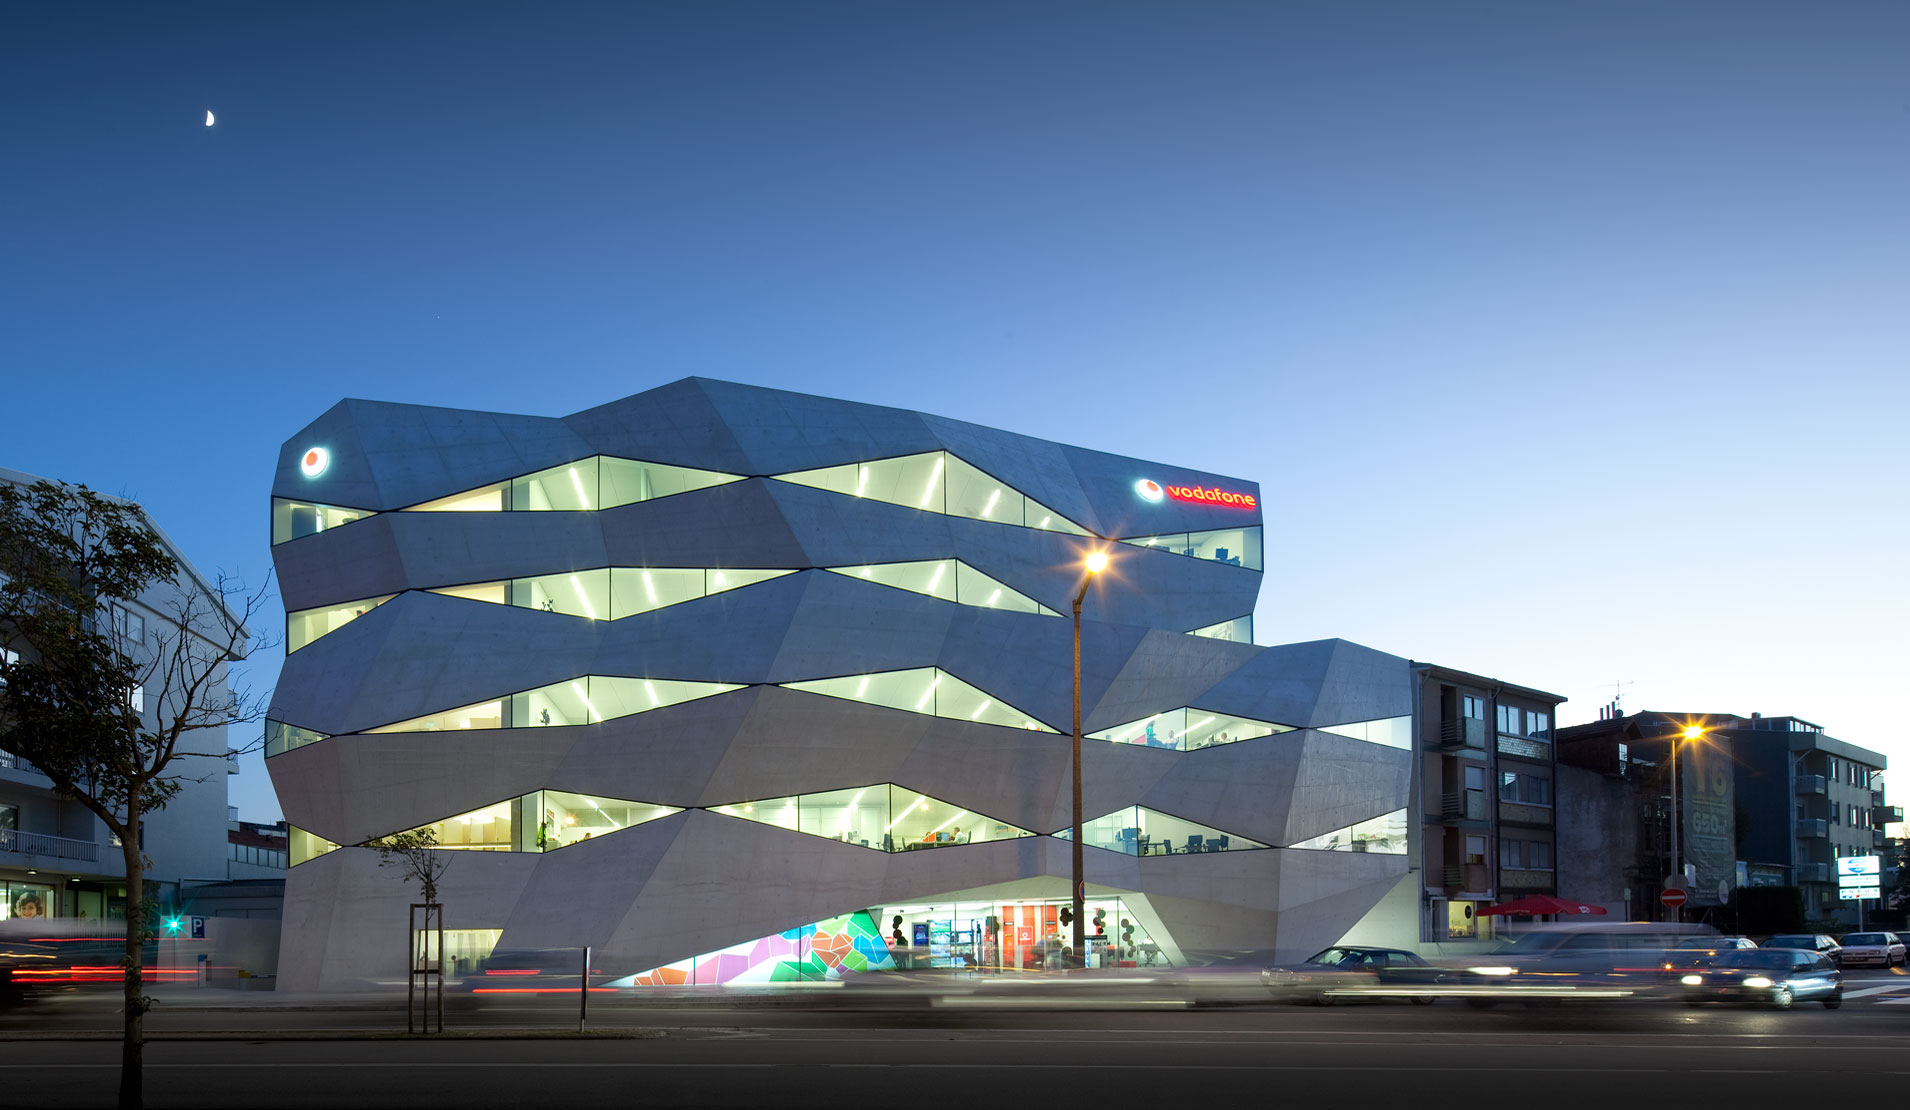 Berühmte Arbeitsplätze: Vodafone Headquarter, Porto